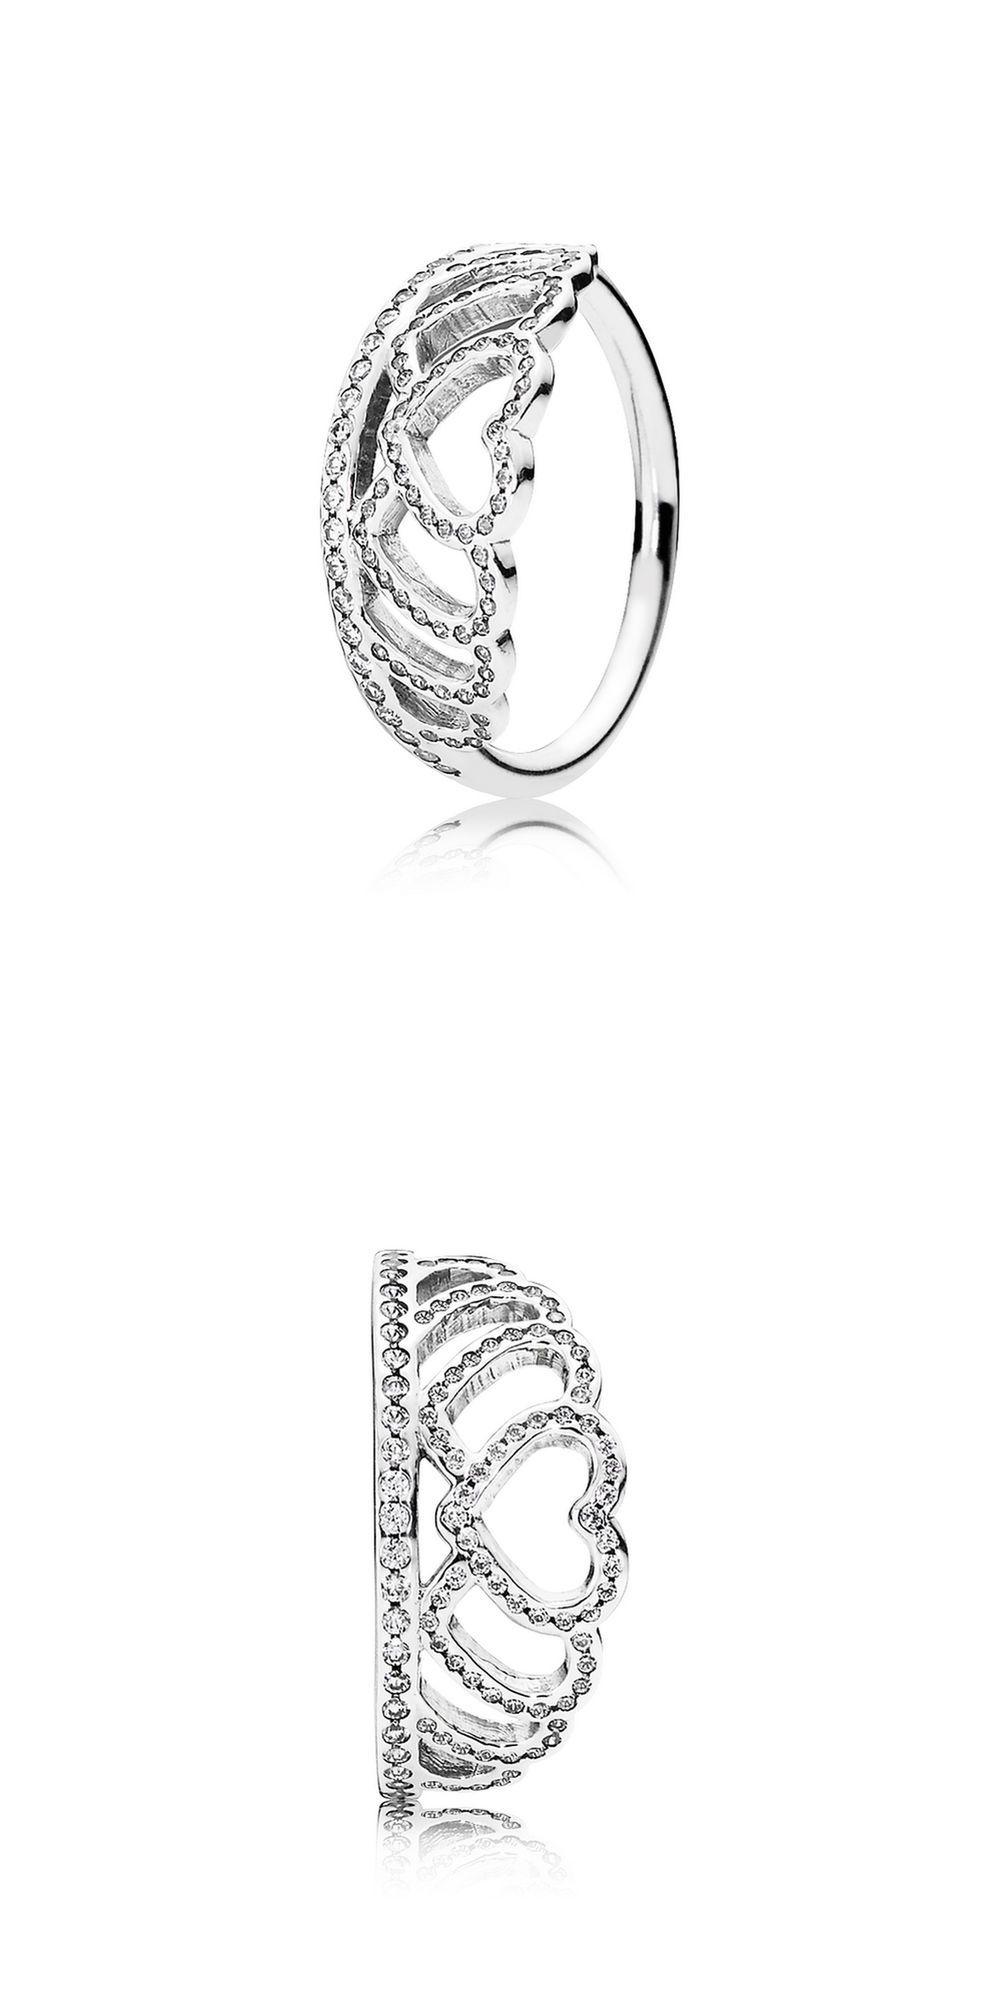 29ce3f7c003b0 ebay pandora rings size 52